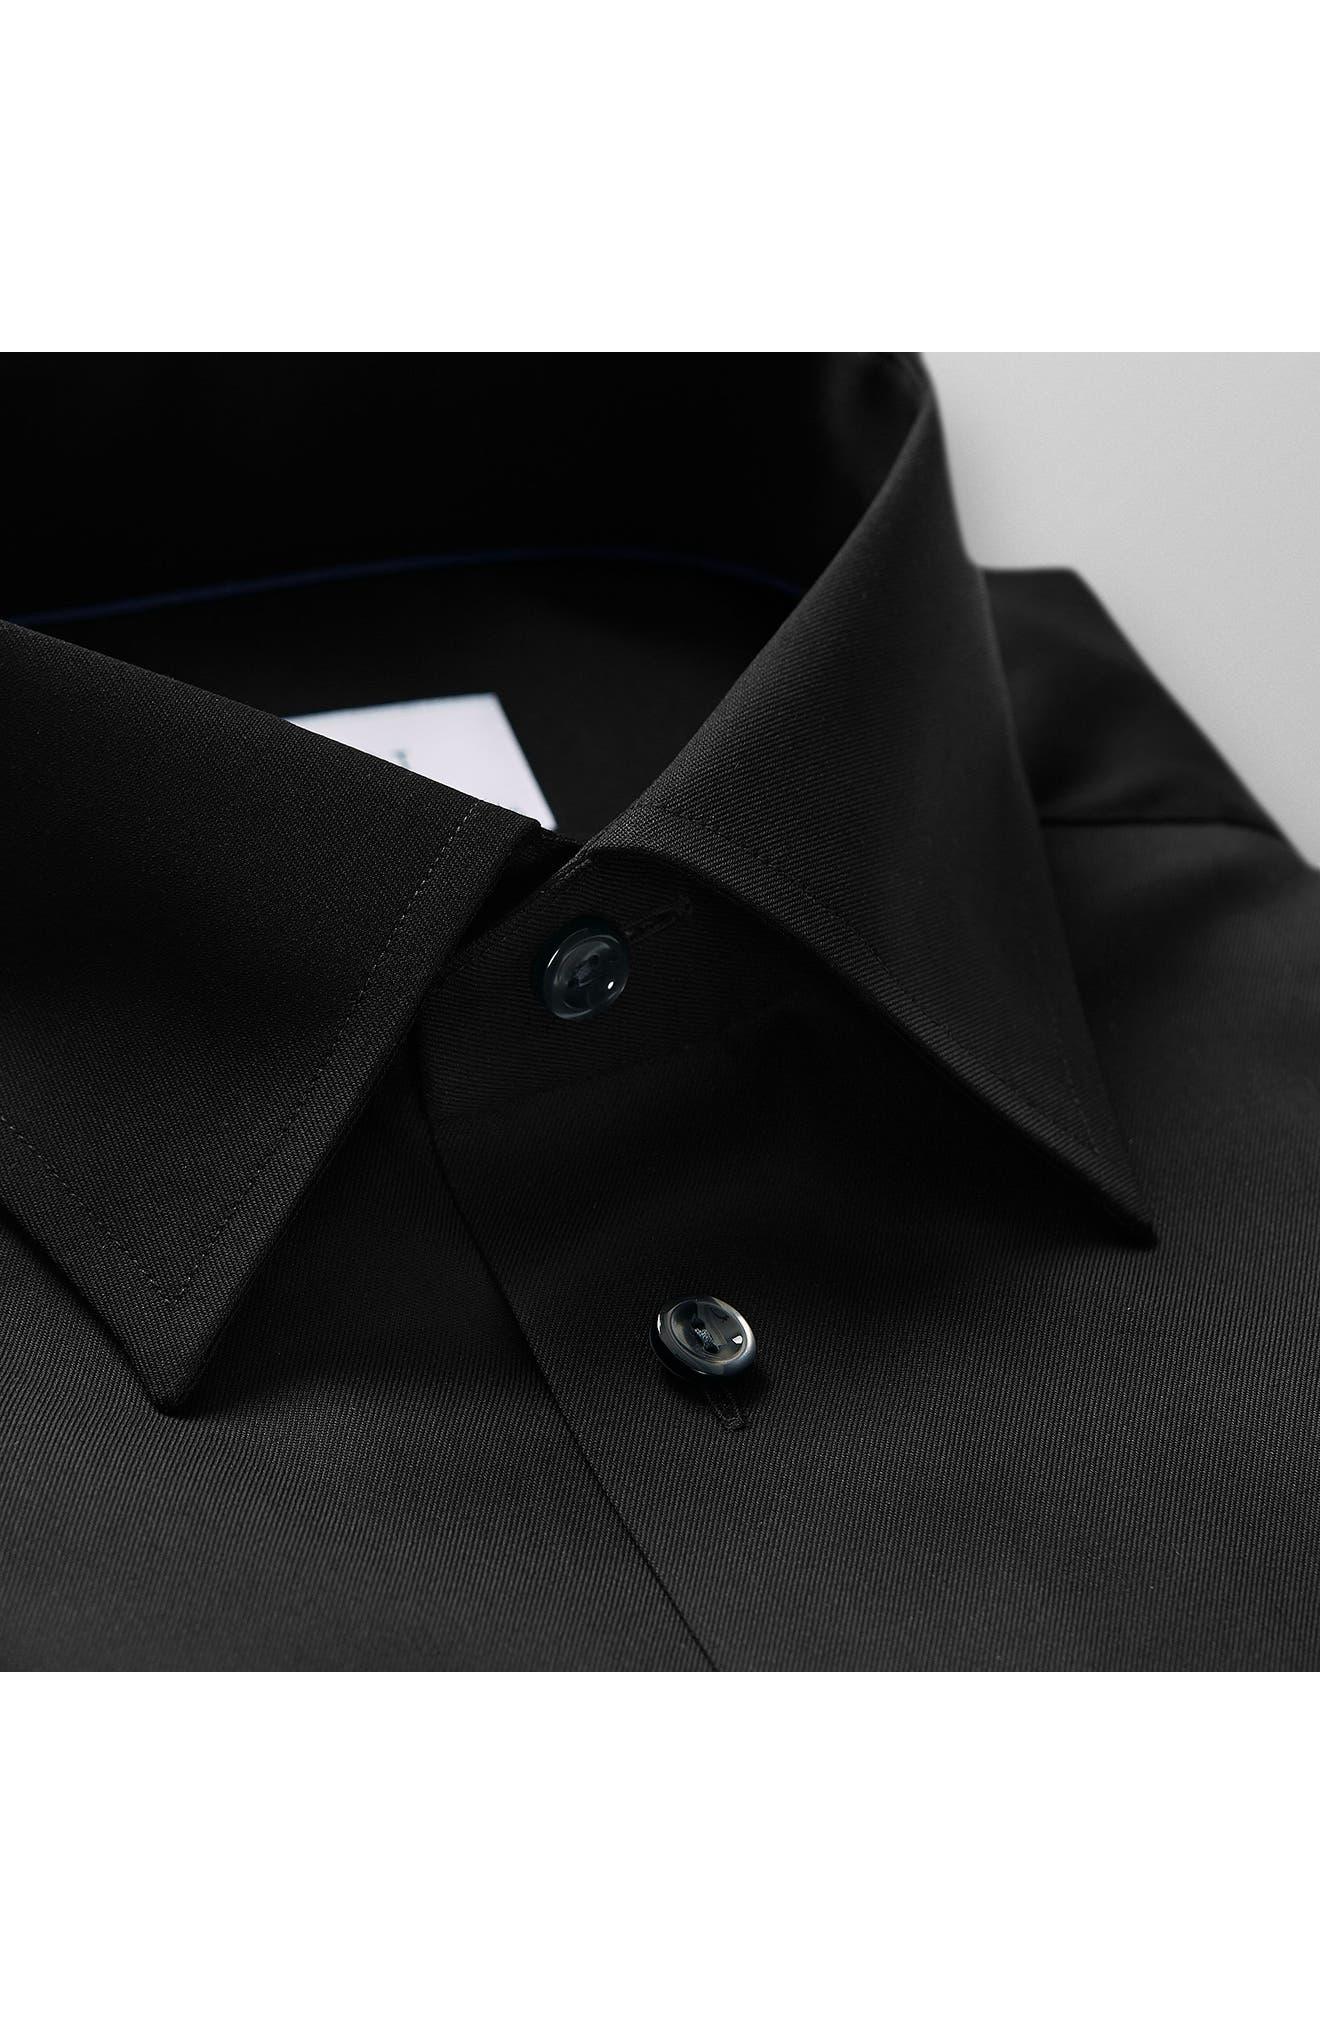 Classic Fit Twill Dress Shirt,                             Alternate thumbnail 2, color,                             001